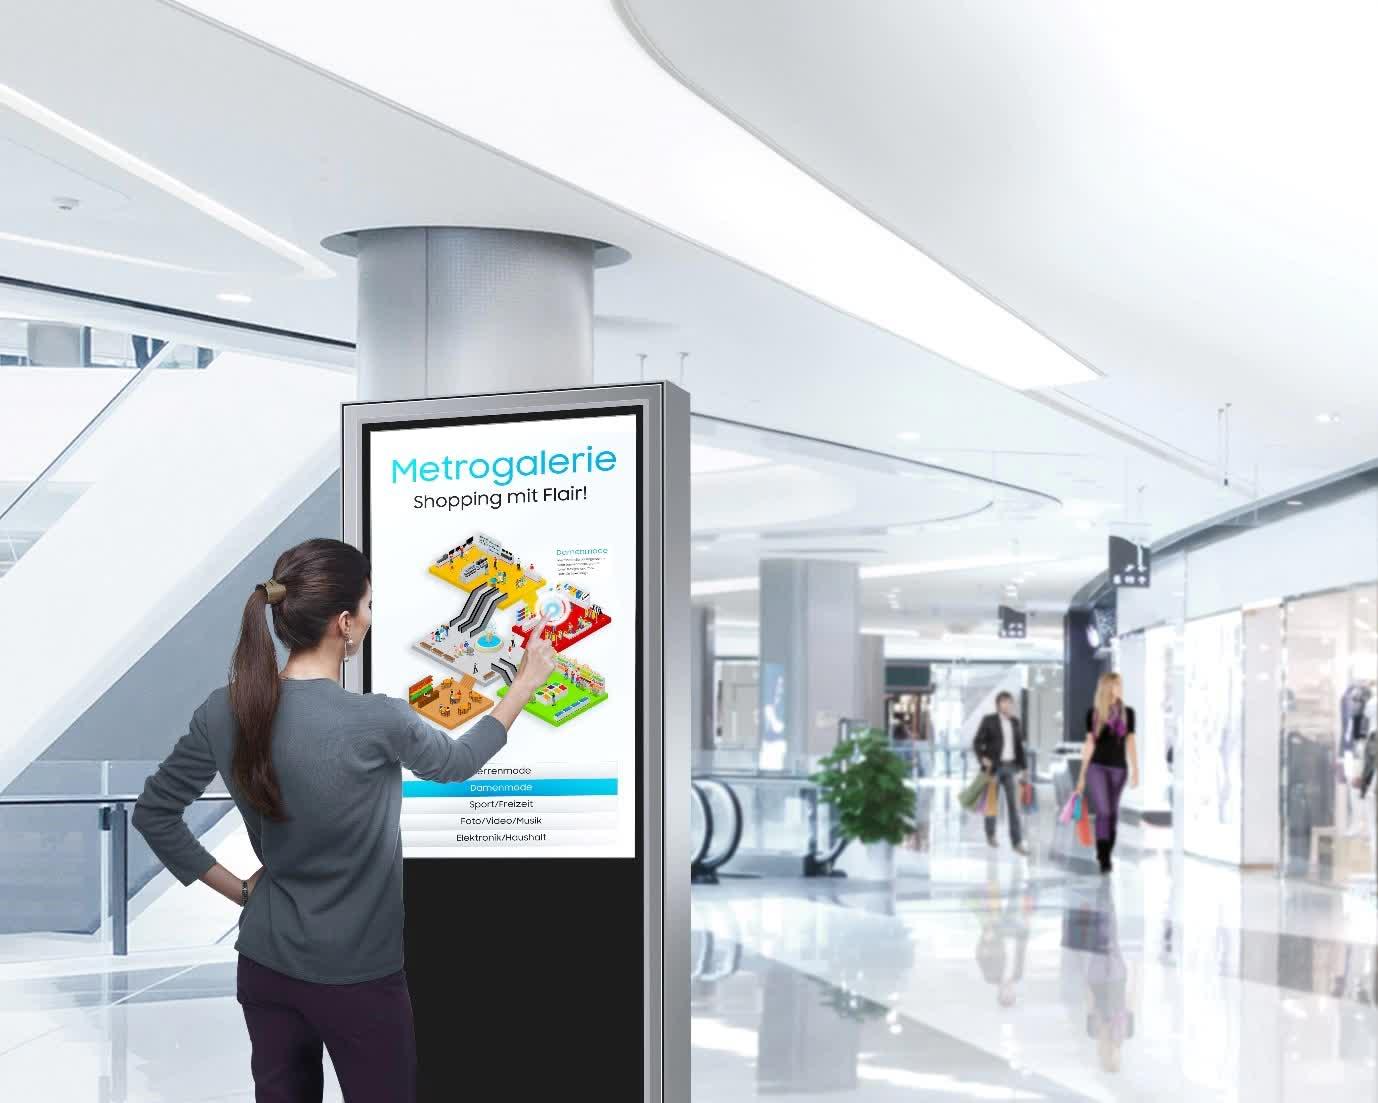 Samsung Profi Displays Interactive